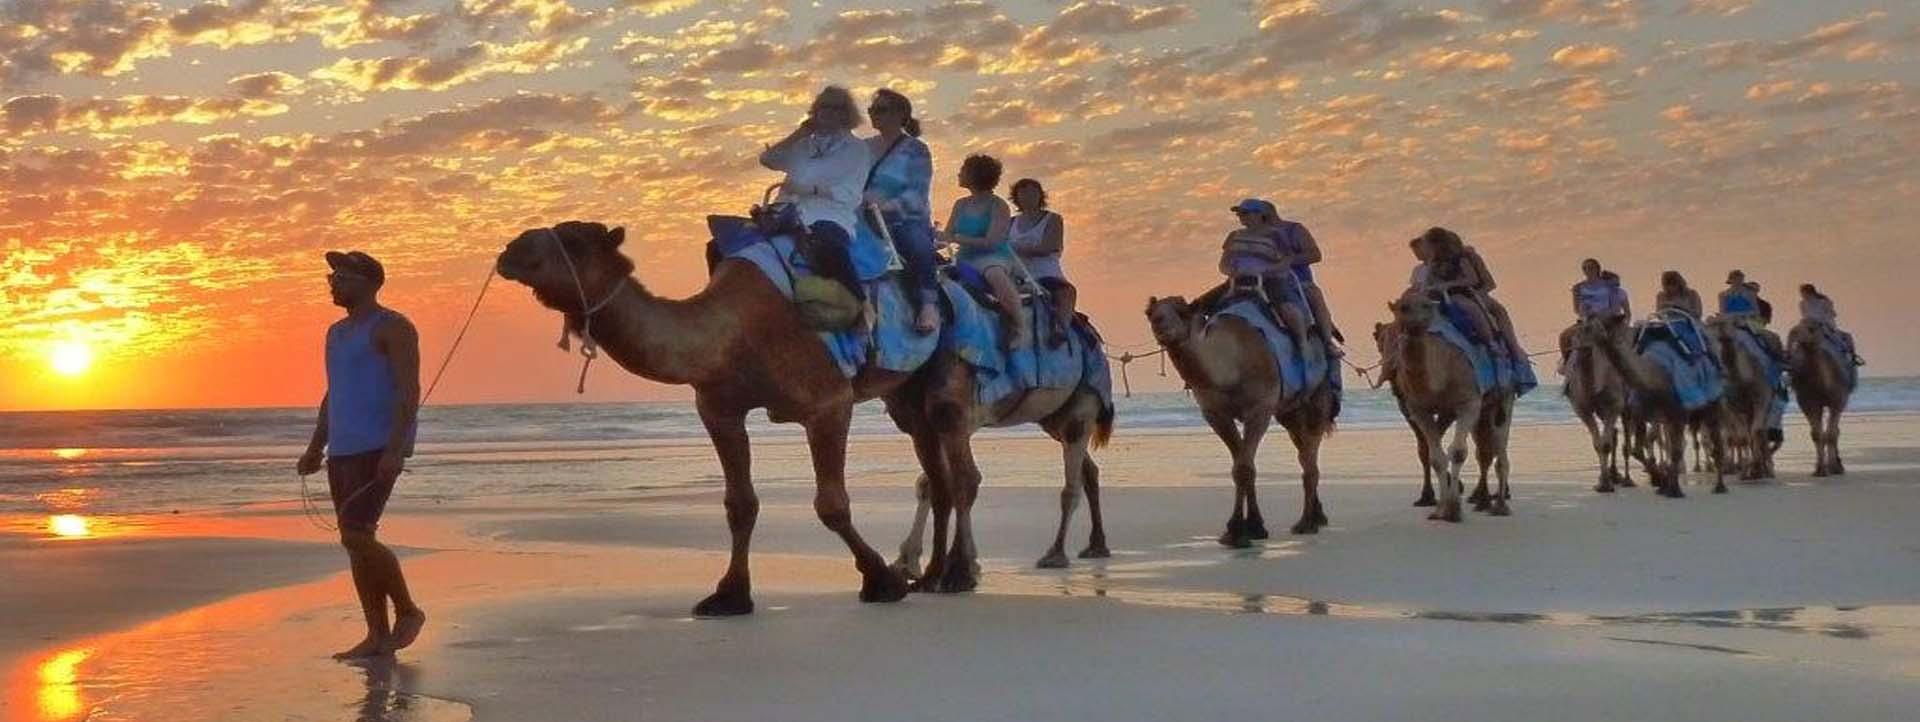 BROOME CAMEL SAFARIS slider Cable Beach